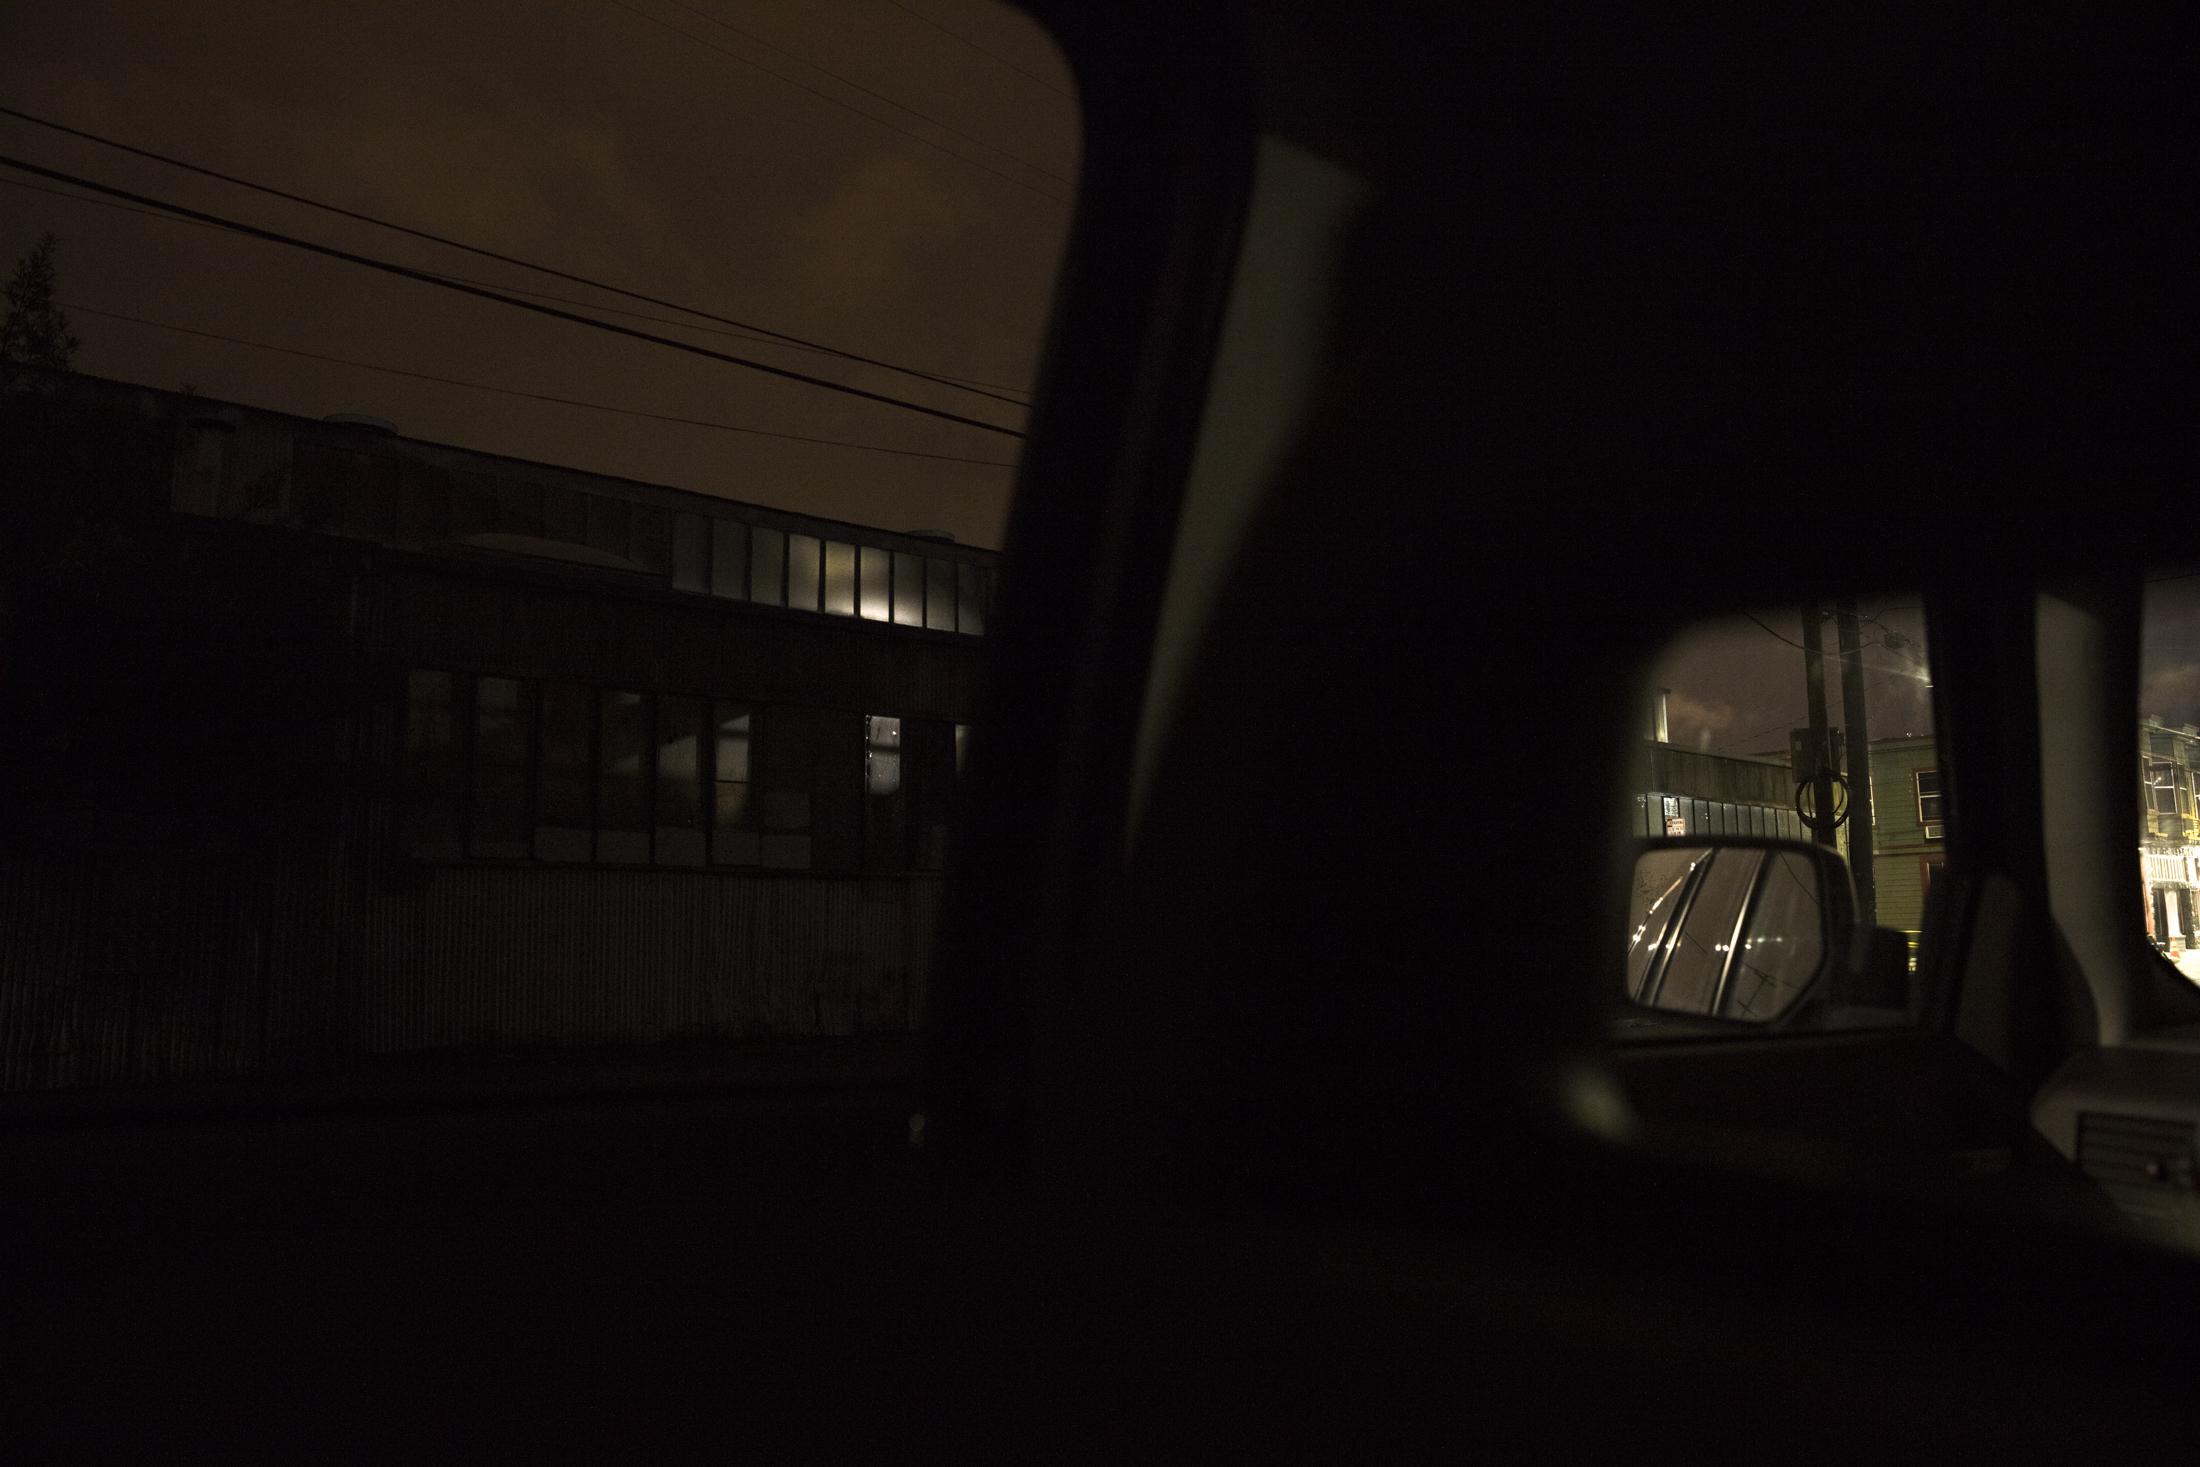 nightdrive-8.jpg